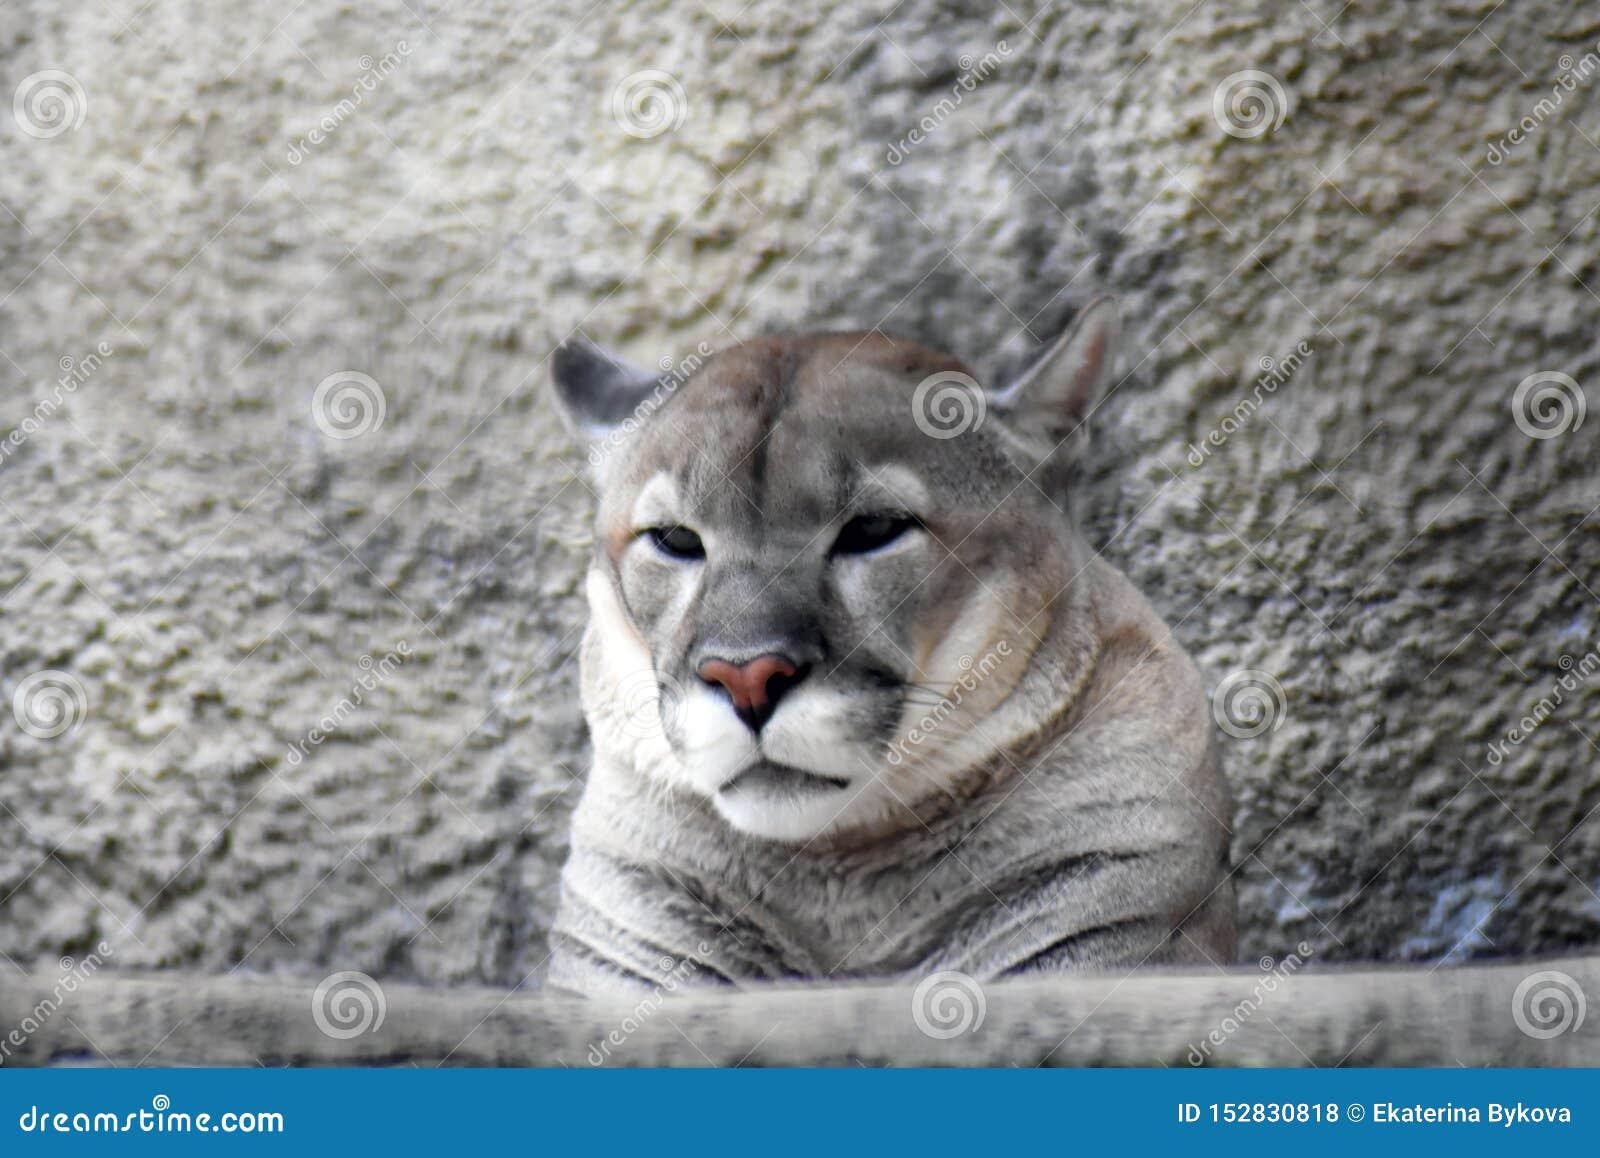 cien Evaluable seguridad  Puma Animal Portrait At Grey Stone Wall Background. Stock Photo - Image of  angry, catamount: 152830818